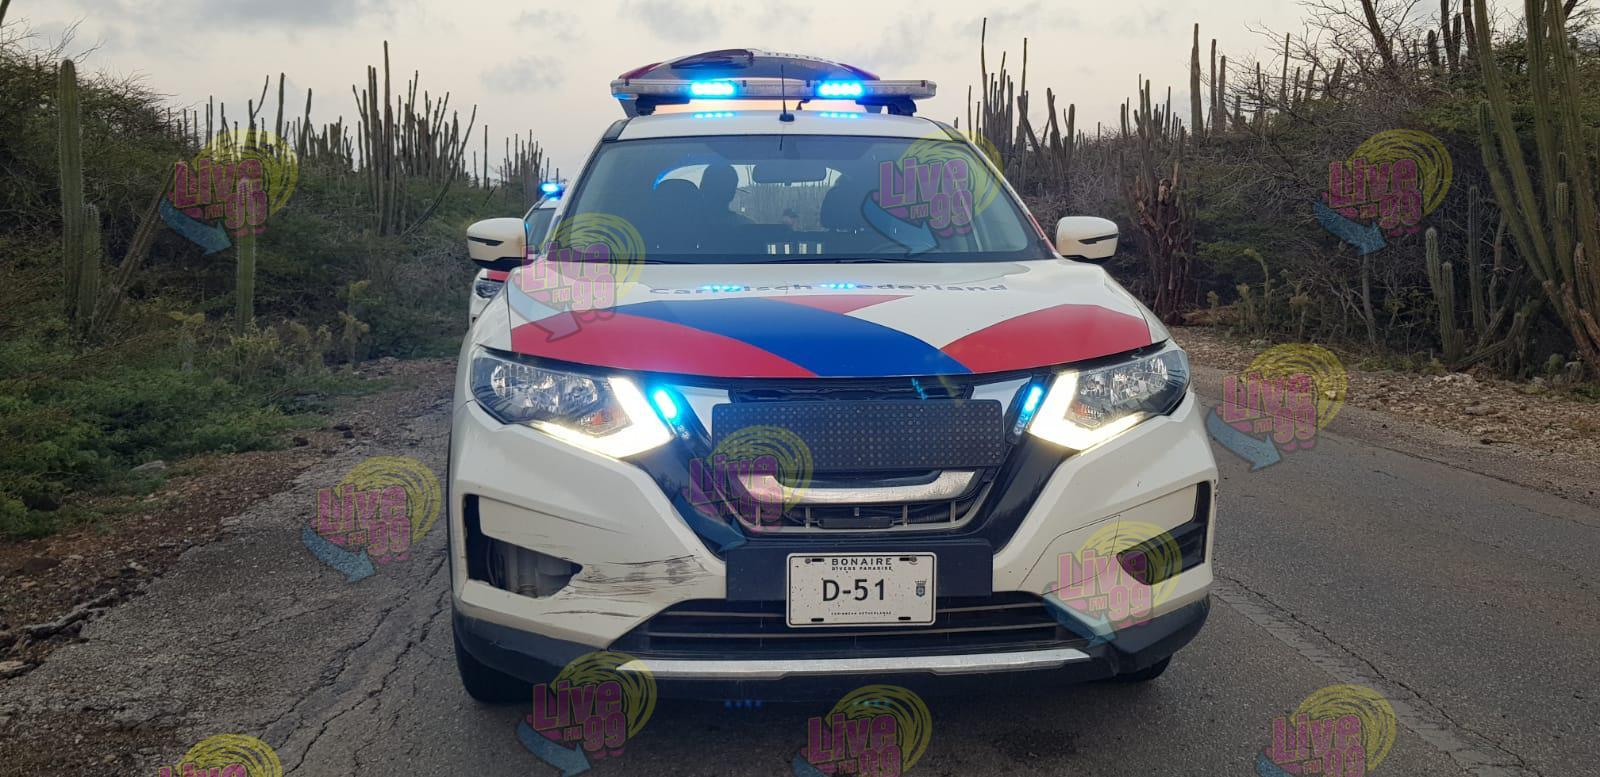 NOTISIA DI POLIS DI DJALUNA 13 DI SÈPTÈMBER TE KU DJÁRASON 15 DI SÈPTÈMBER 2021